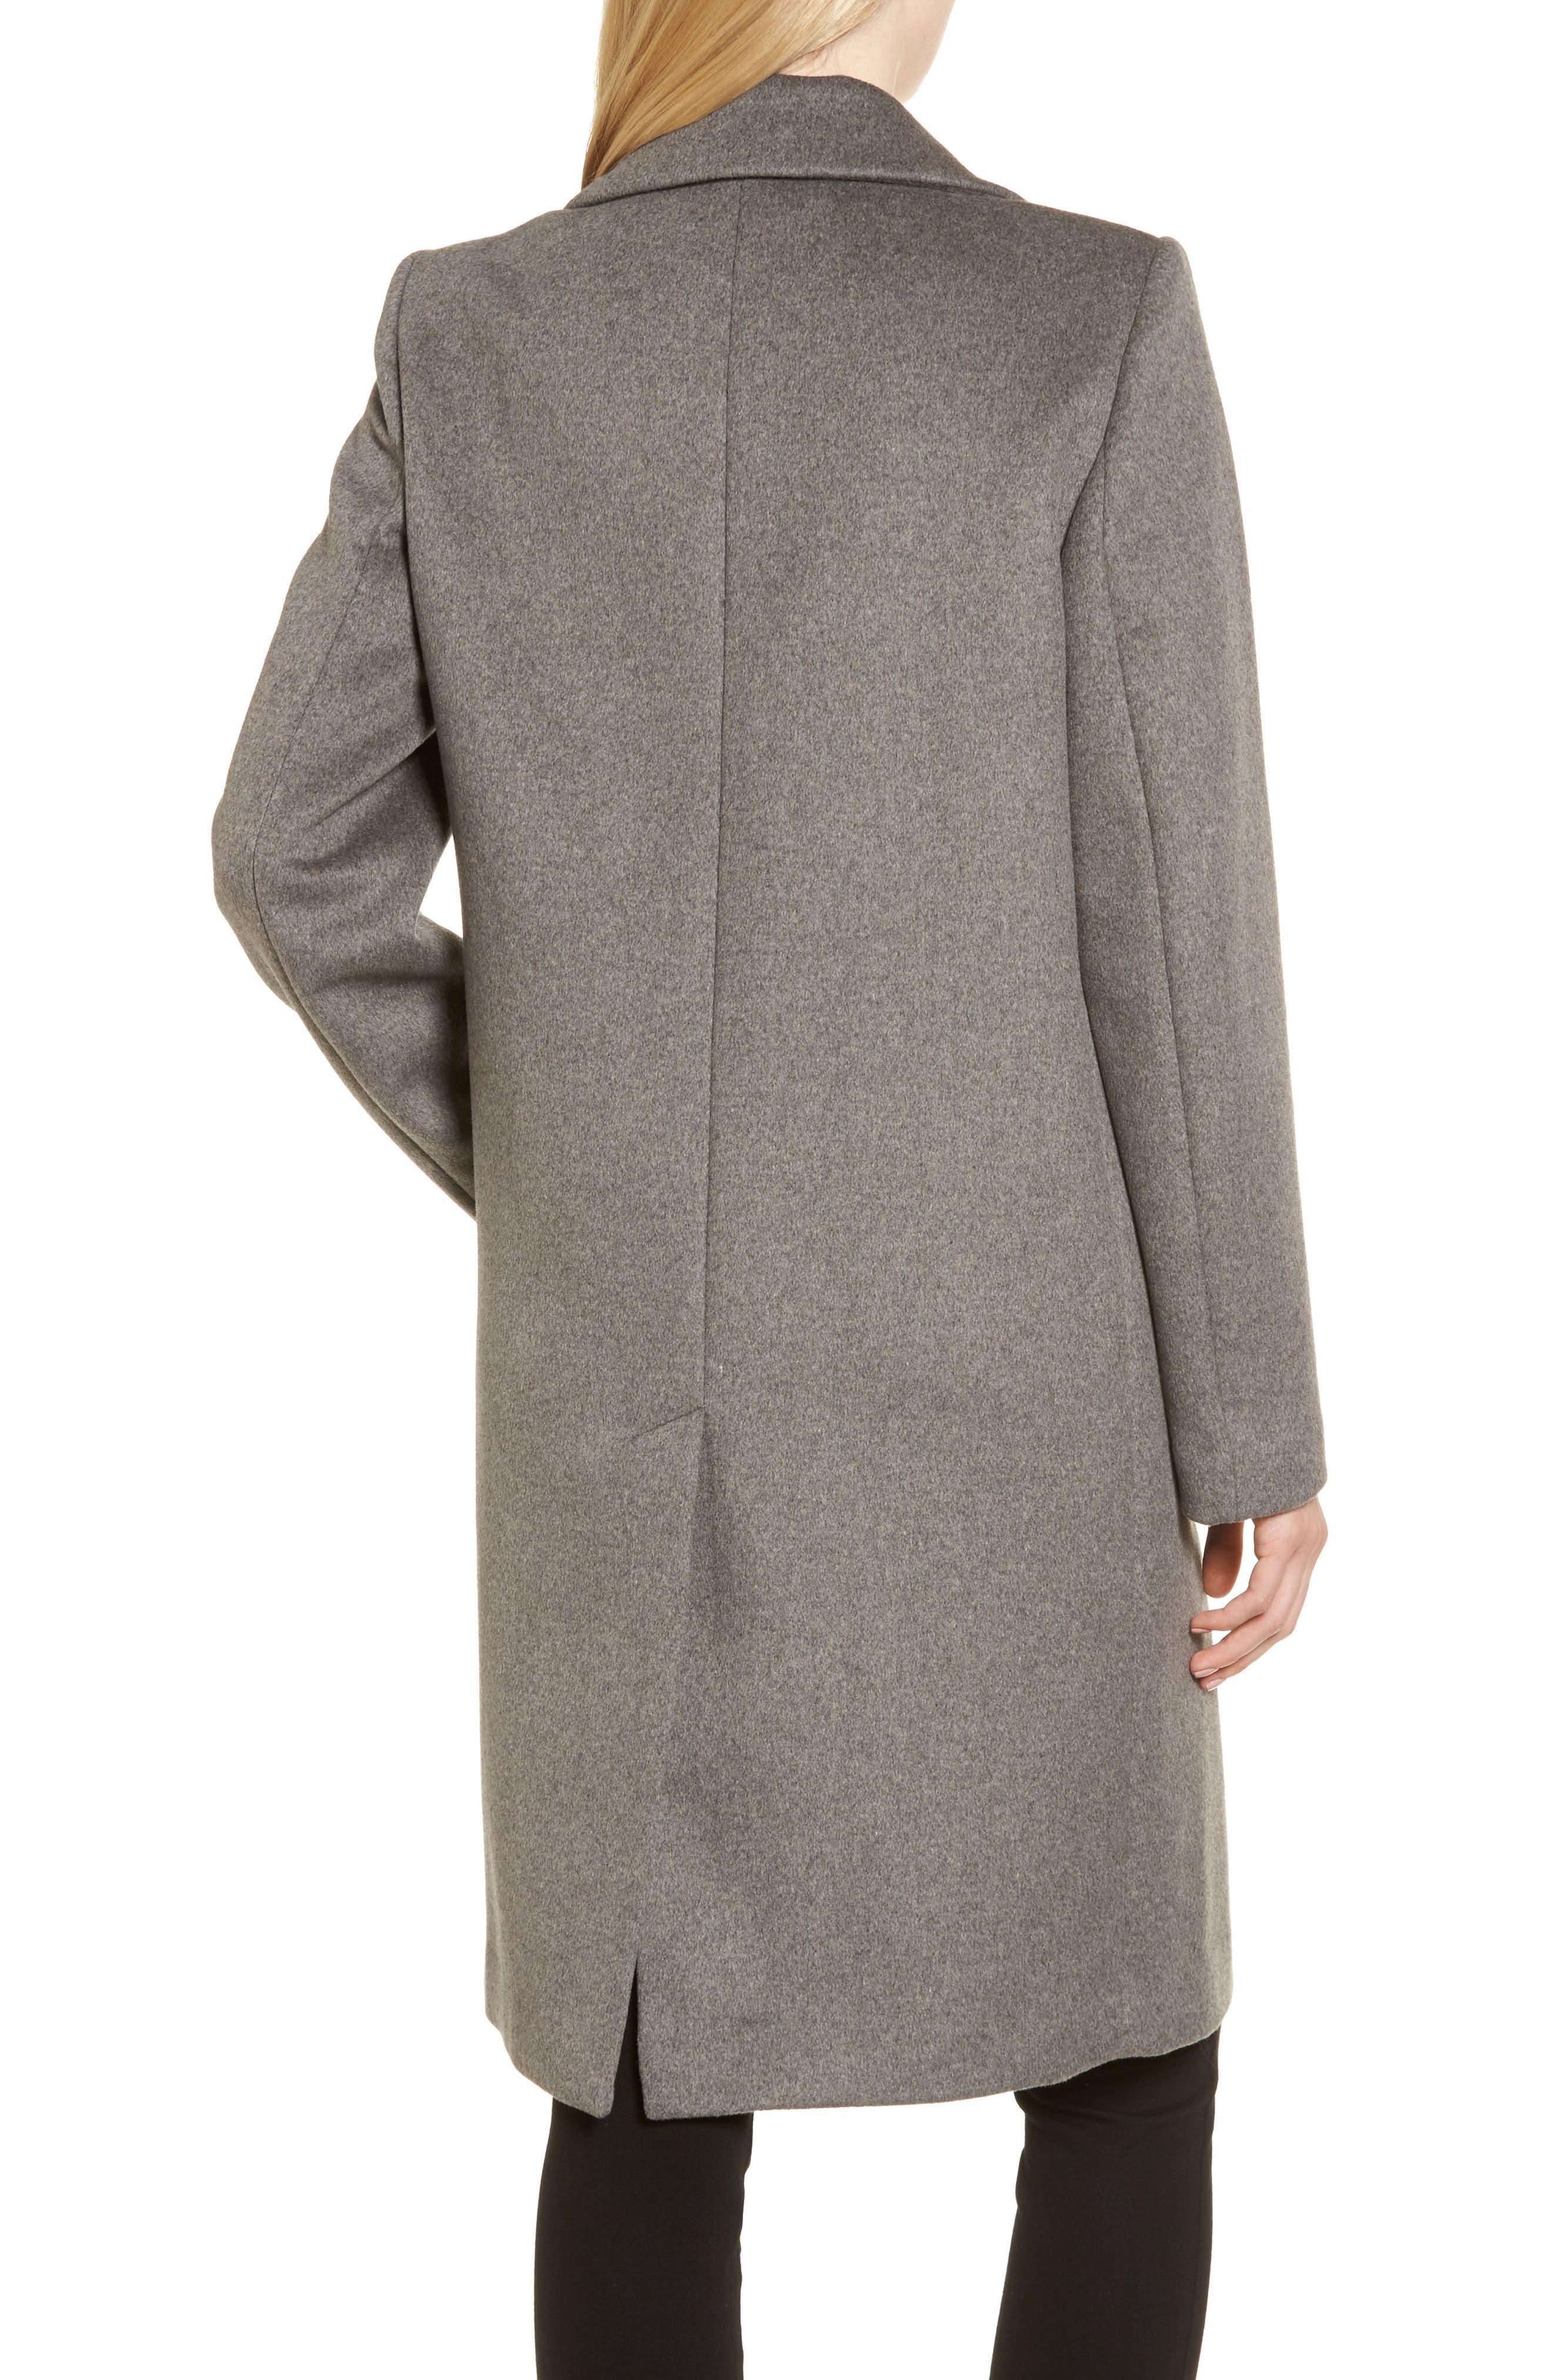 DKNY Lavish Wool Blend Coat,                             Alternate thumbnail 4, color,